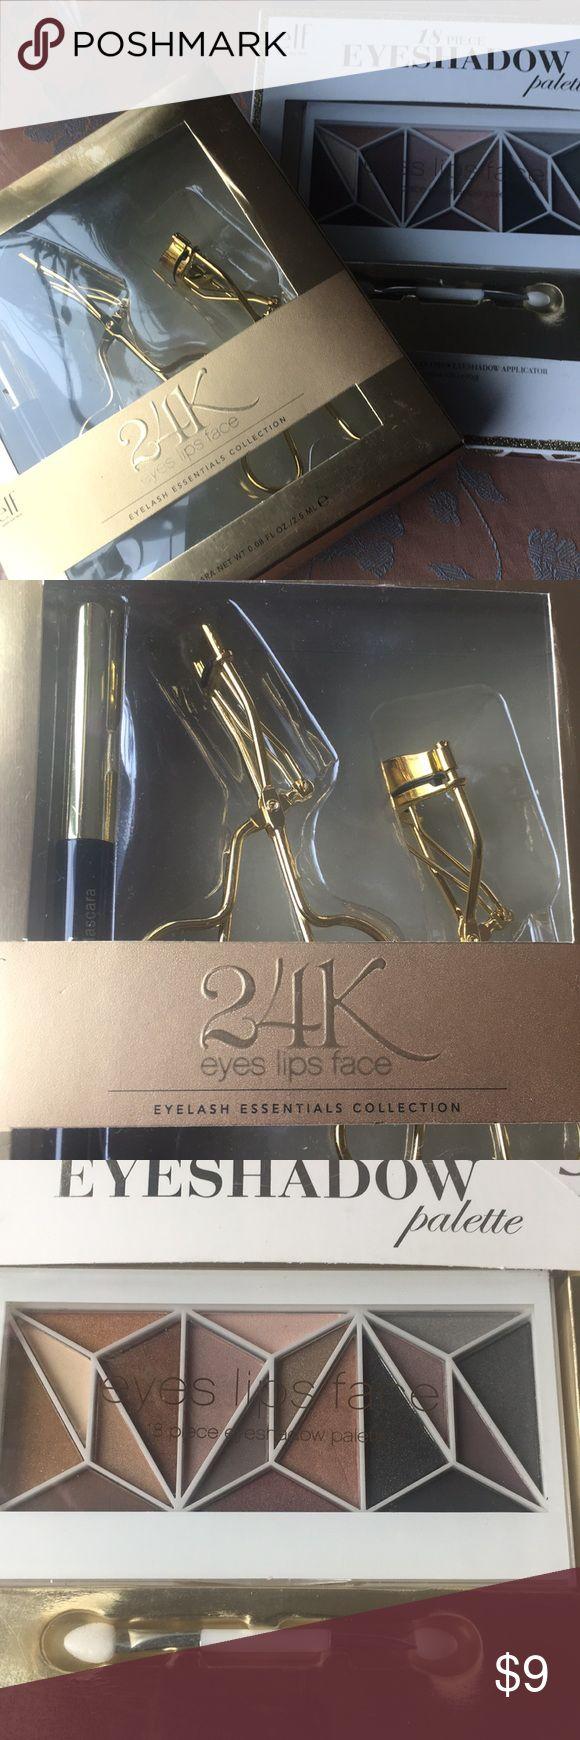 Elf eye bundle Elf 24k eyelash essentials kit with mascara , large lash curler and mini lash curler for individual lashes.  And 18 piece eyeshadow palette with applicator ELF Makeup